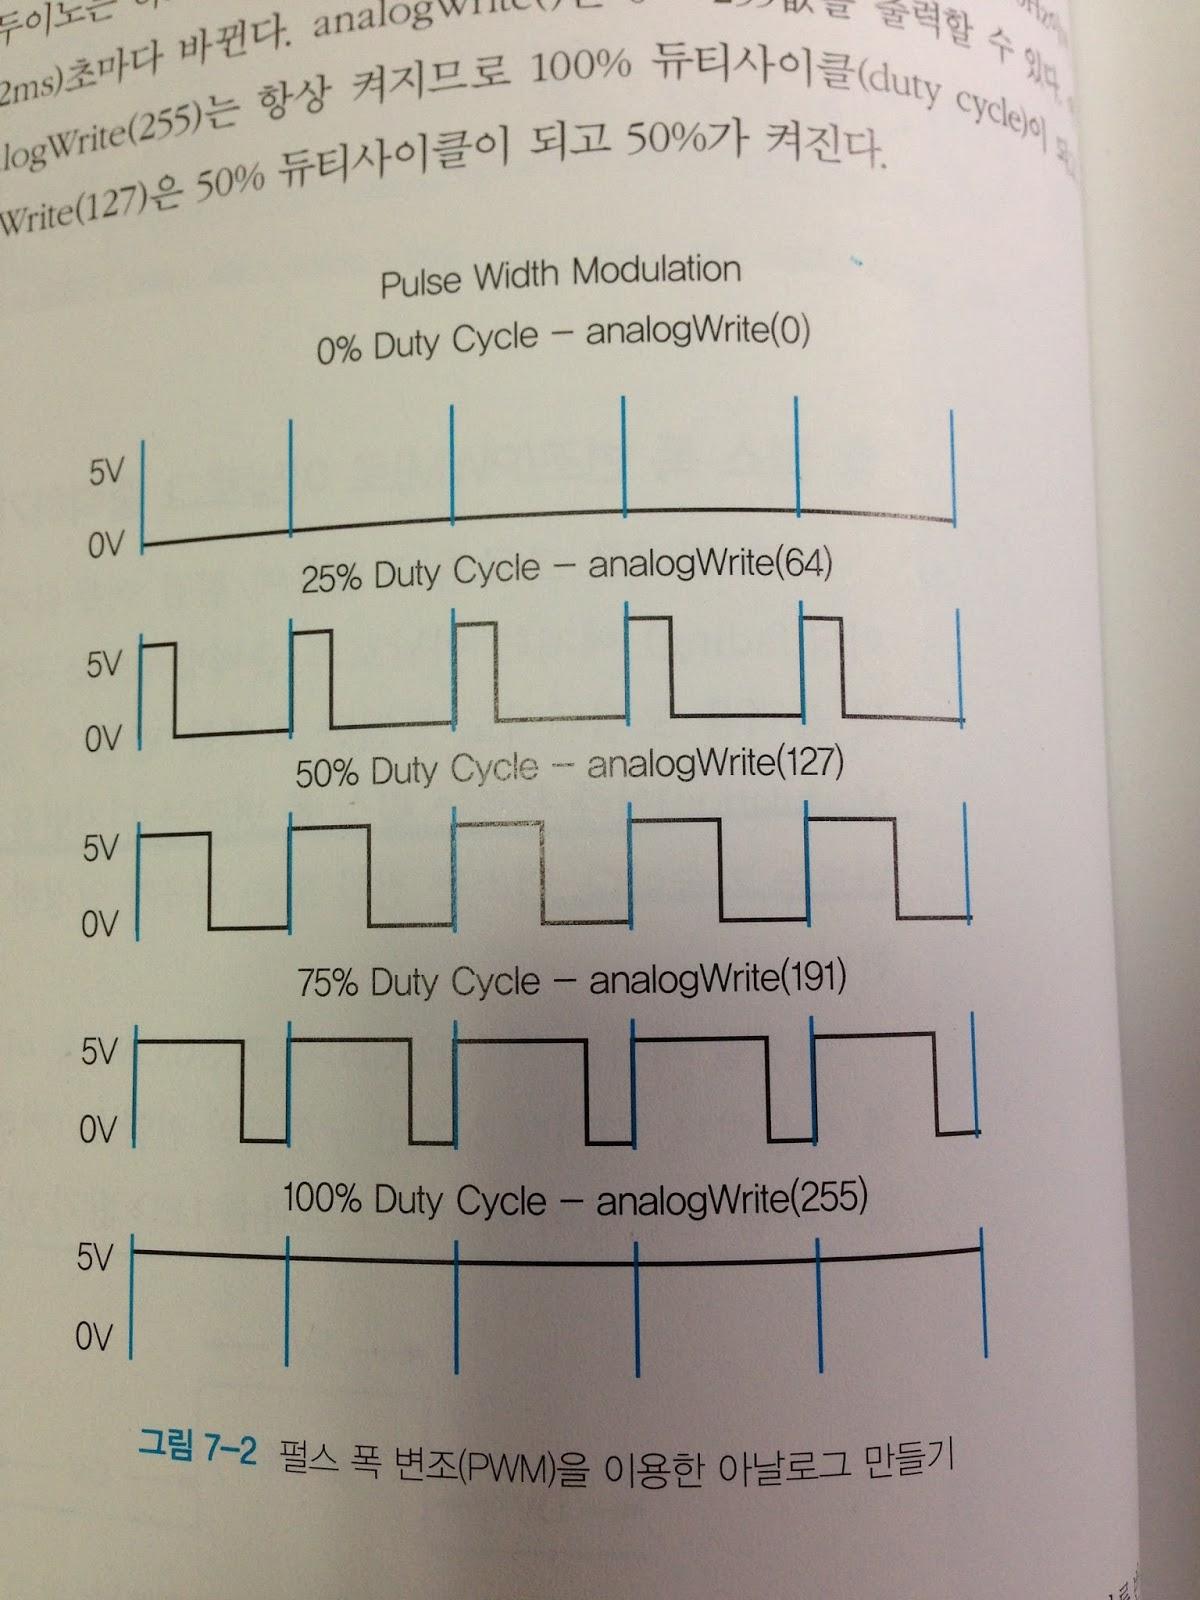 MARE's Computer Vision Study : (Arduino study) LED brightness change